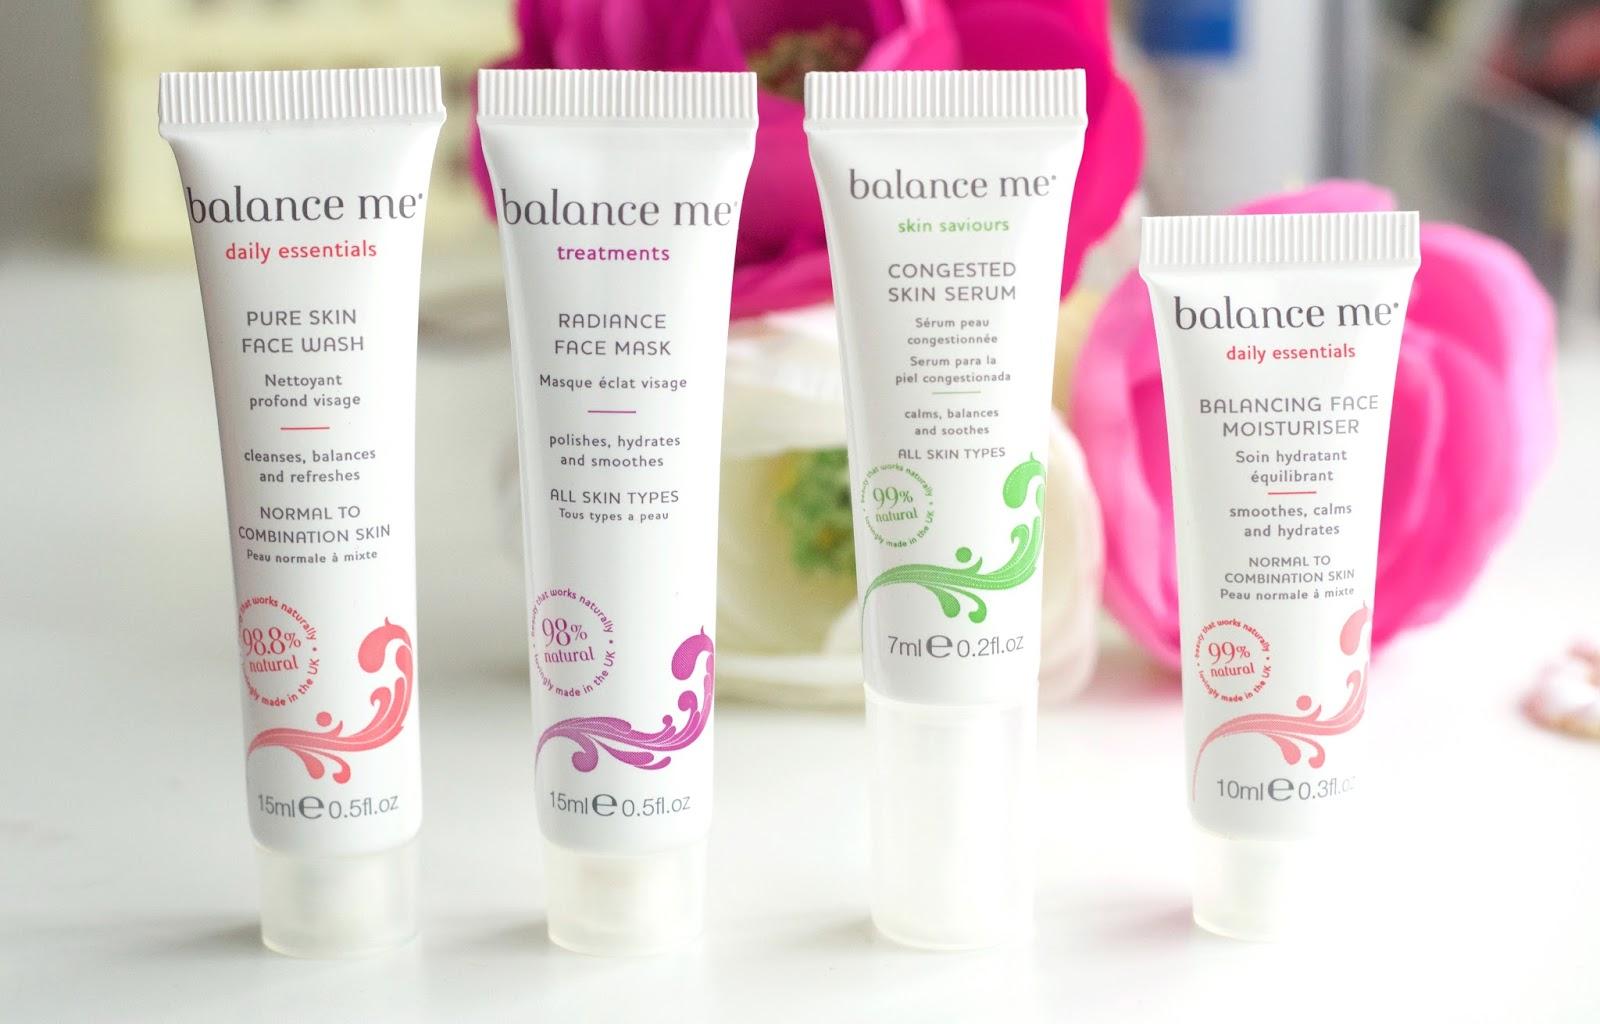 My Opinion On Balance Me Skincare